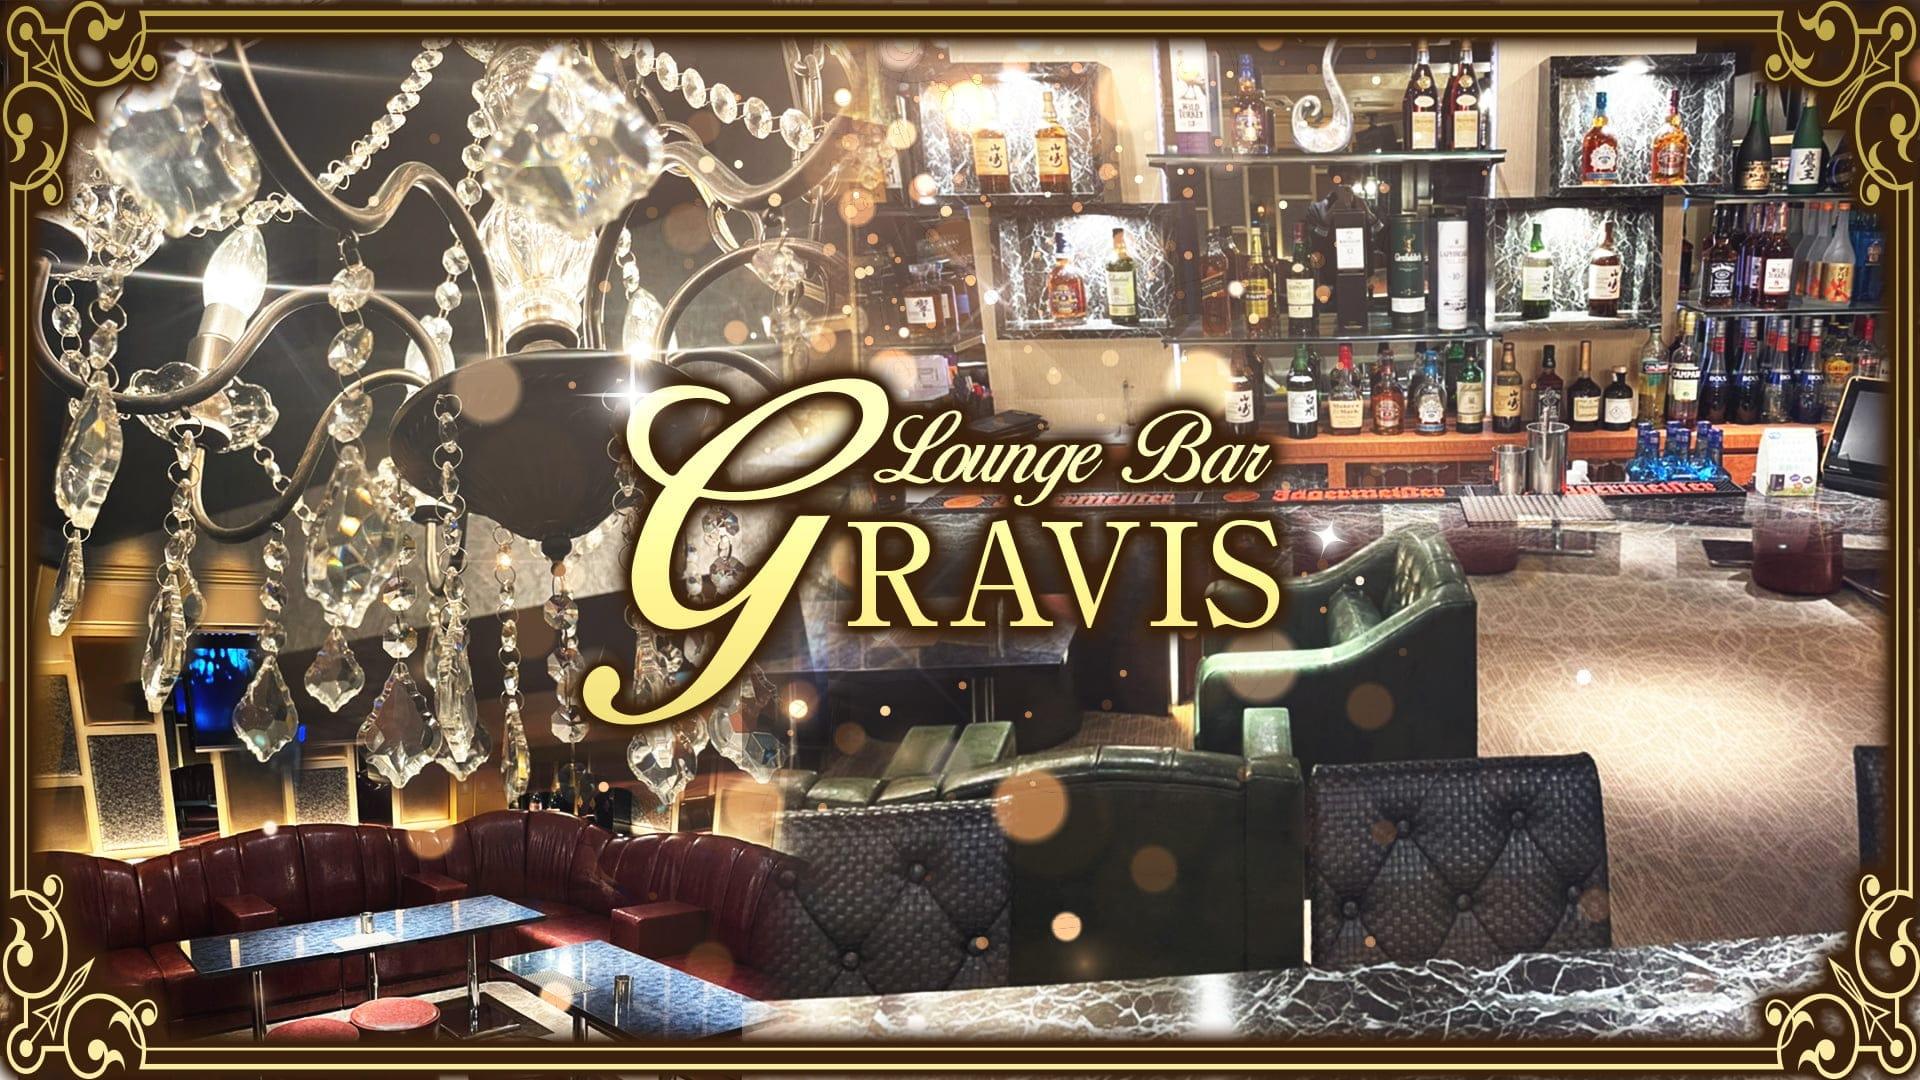 Lounge Bar GRAVIS(グラヴィス)【公式求人・体入情報】 恵比寿ラウンジ TOP画像